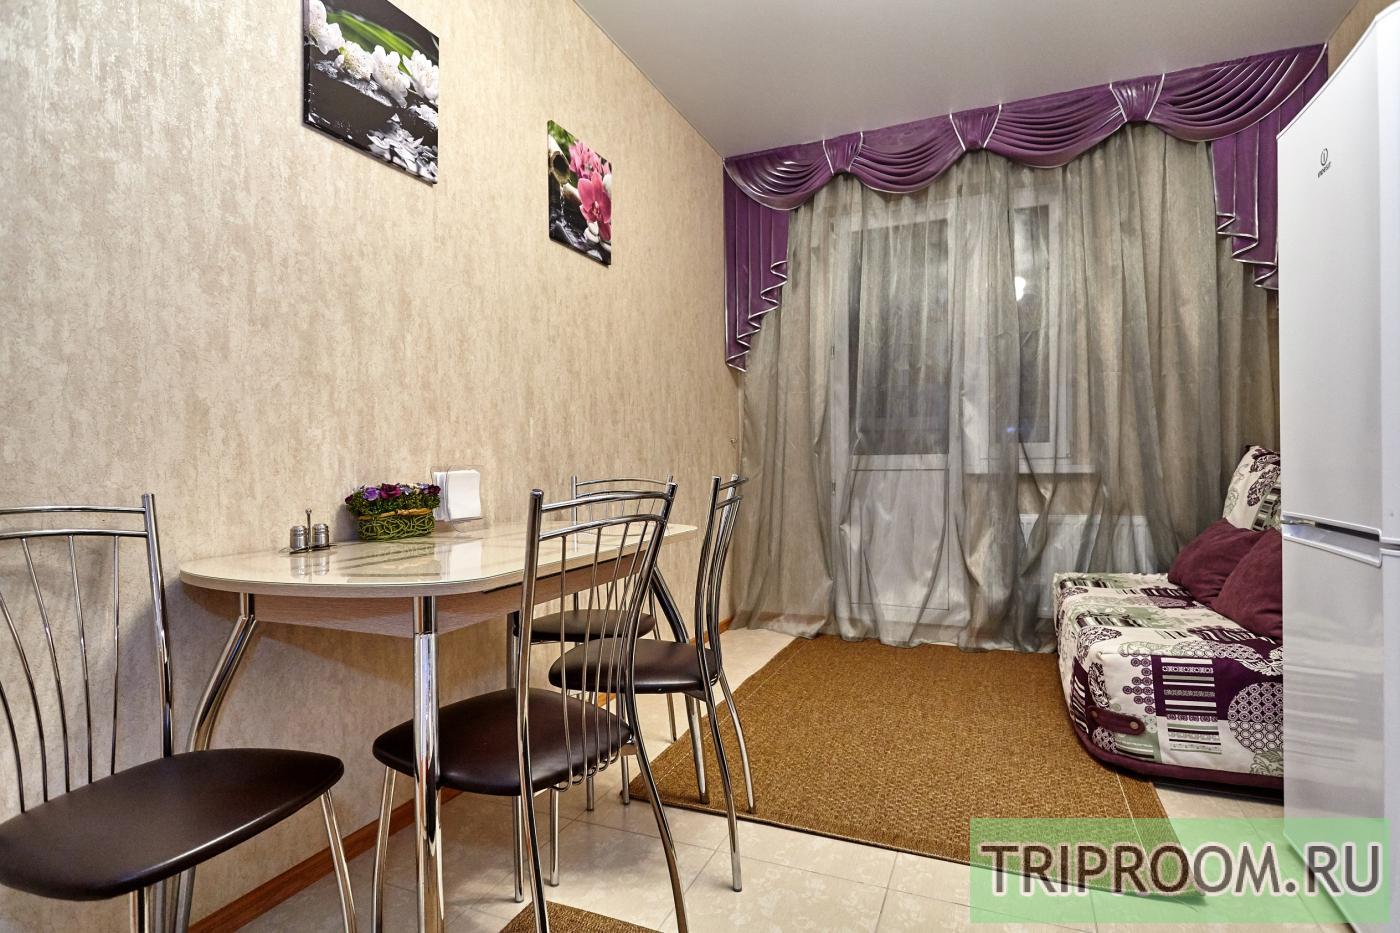 1-комнатная квартира посуточно (вариант № 6860), ул. Соколова улица, фото № 7